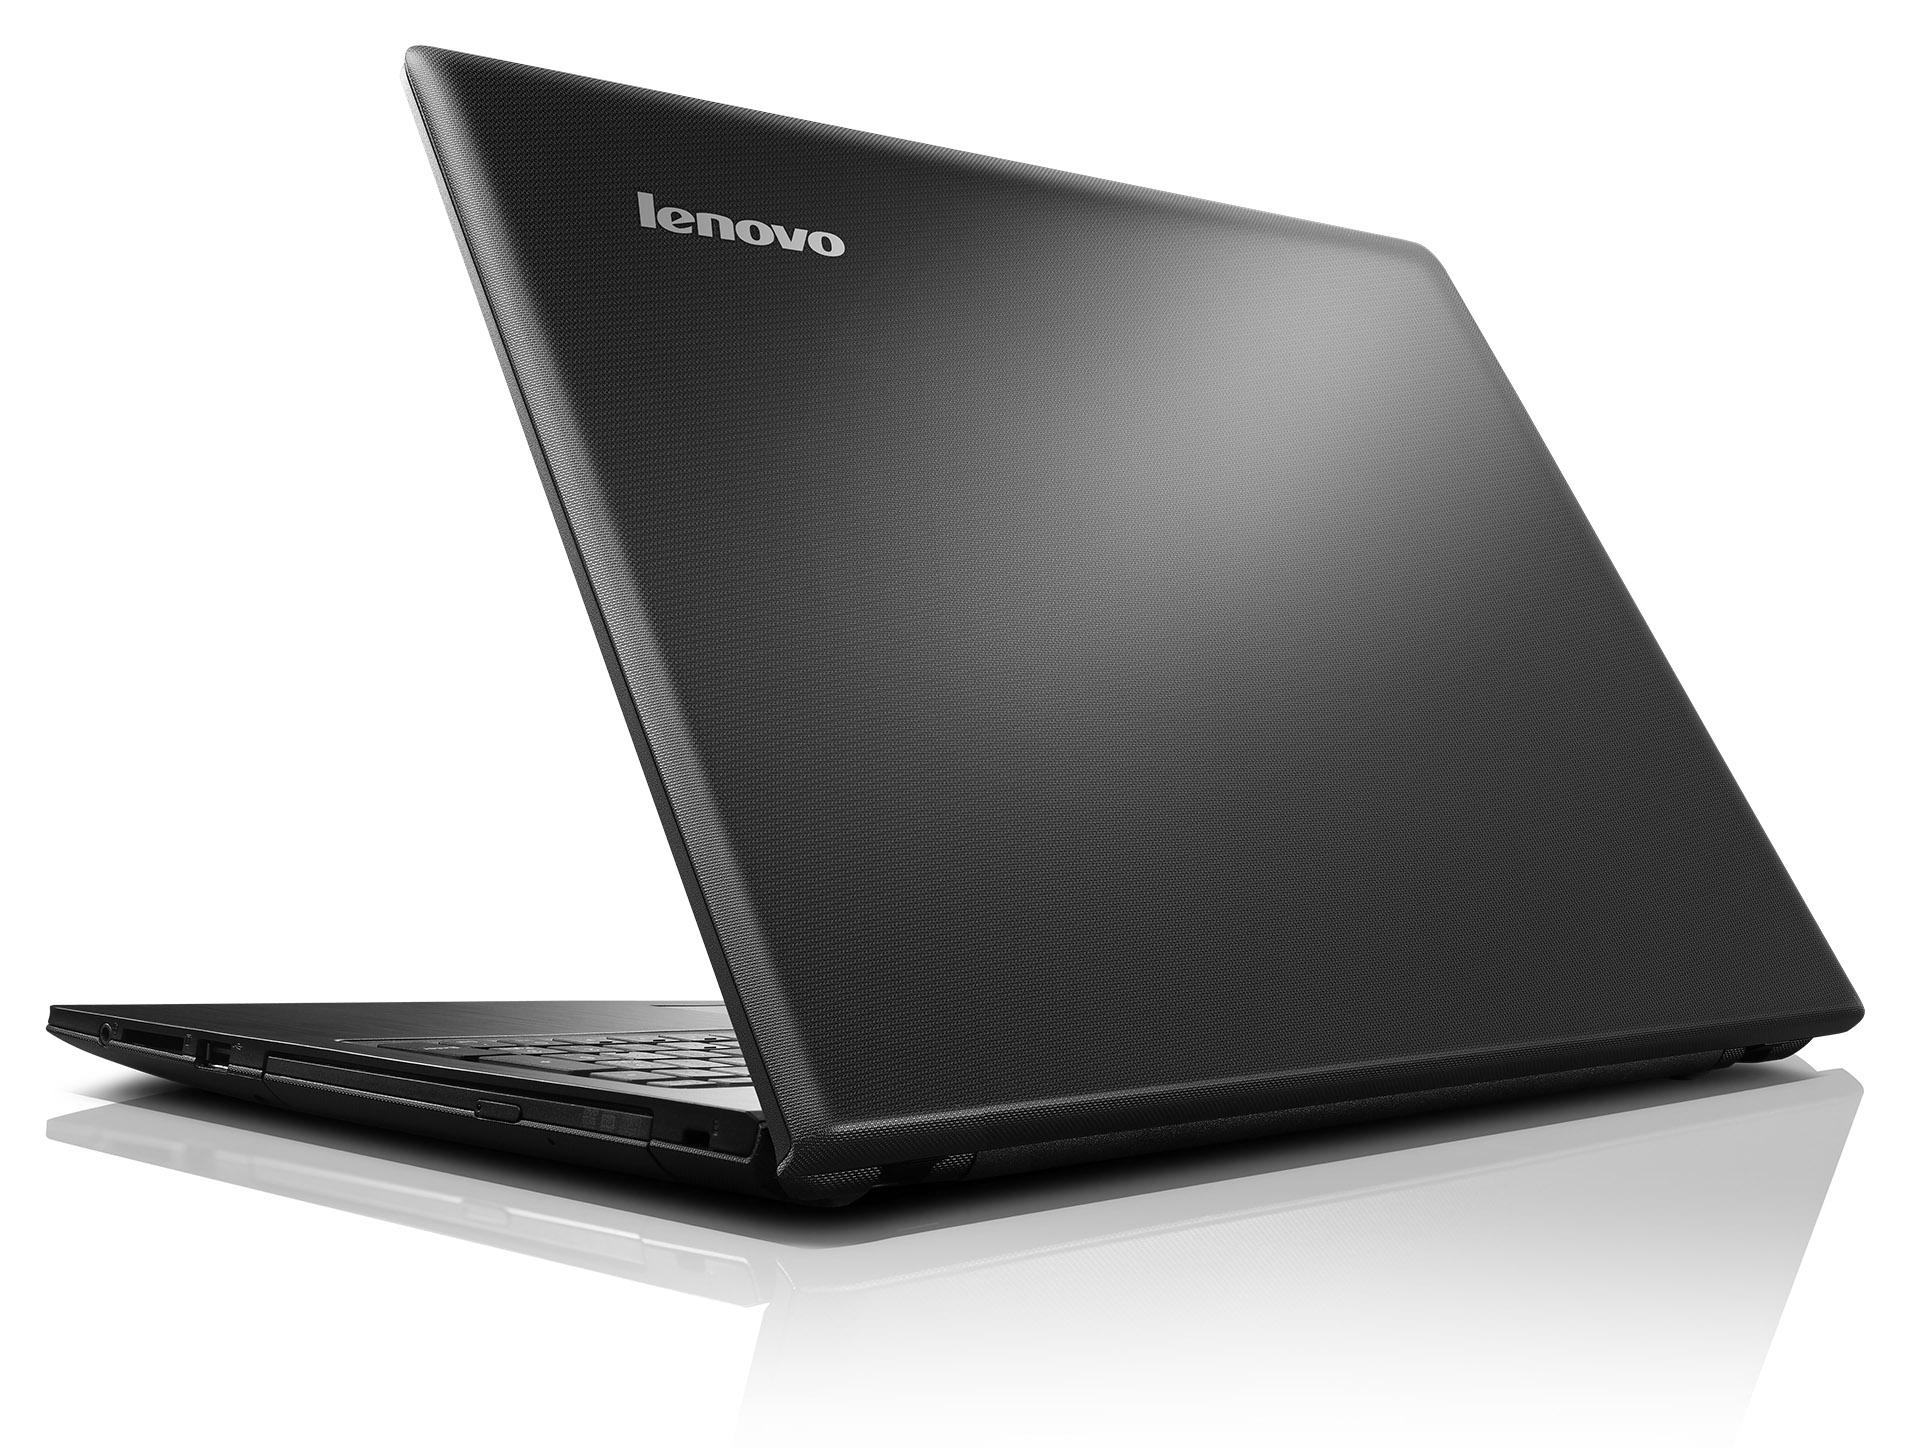 Lenovo IdeaPad G500S notebook, laptop (59-376721_8GB), 8GB RAM-mal!!!